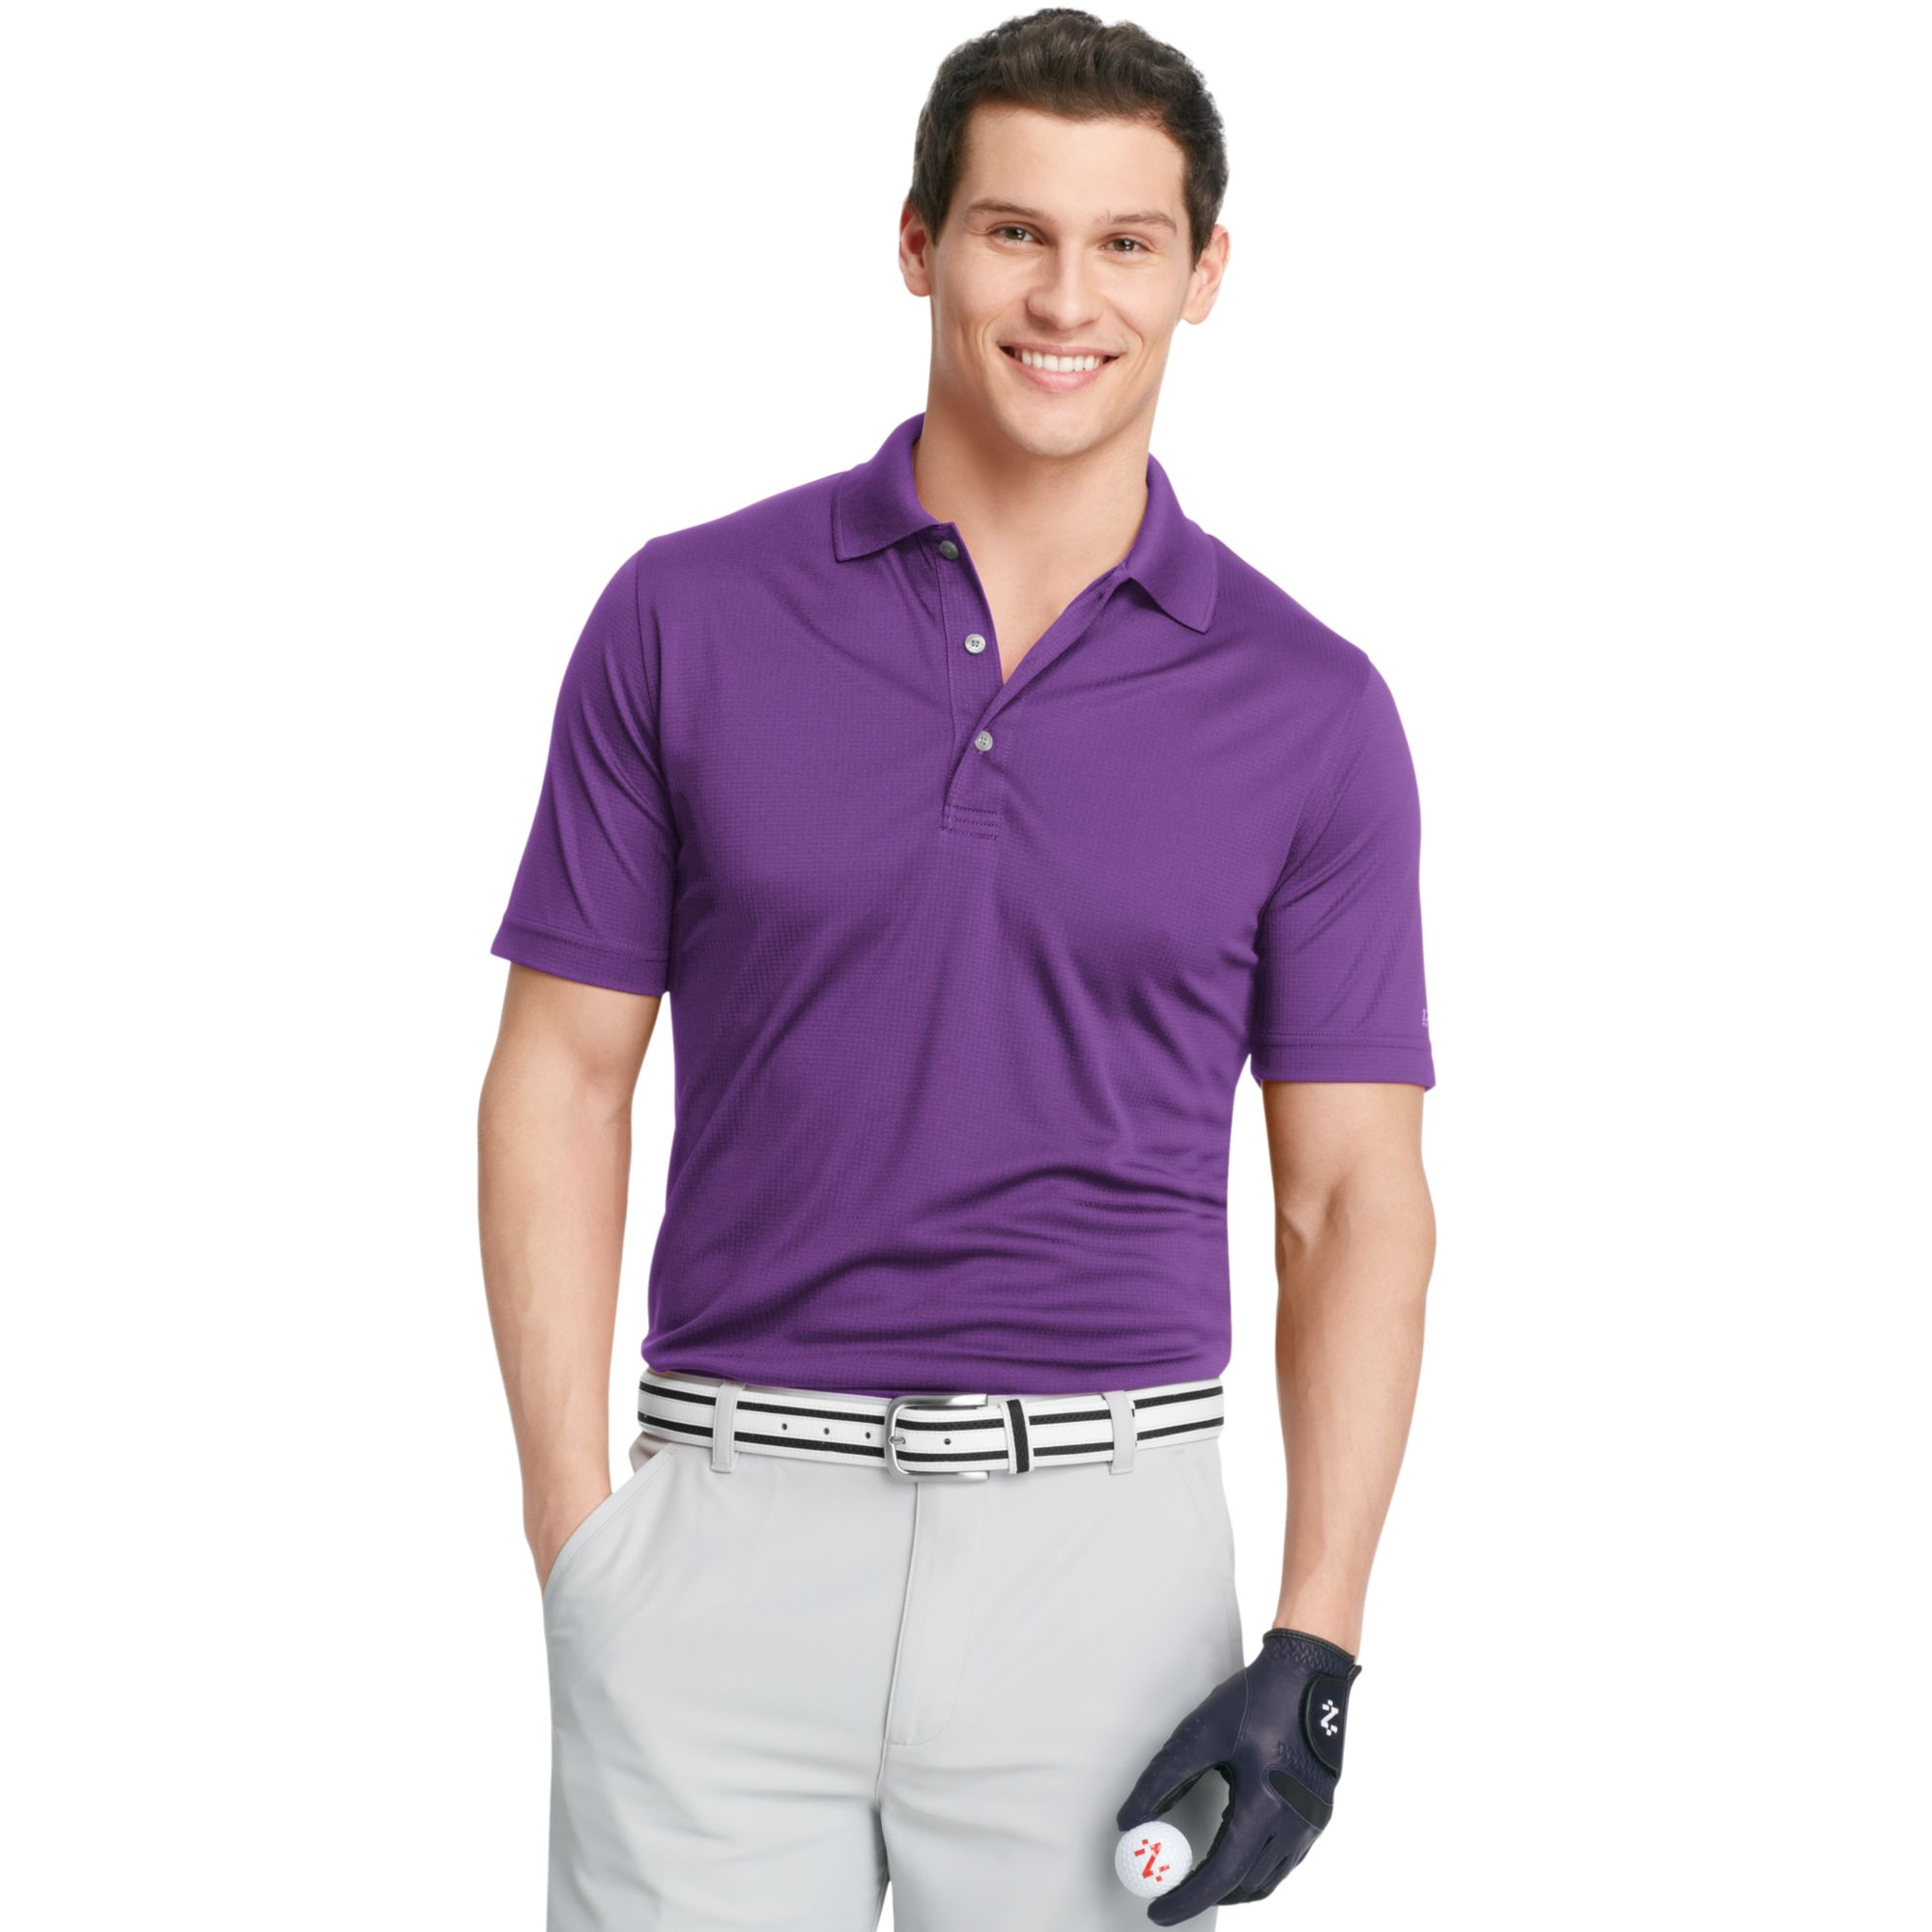 Nike Golf Apparel Amazon Summer Cook